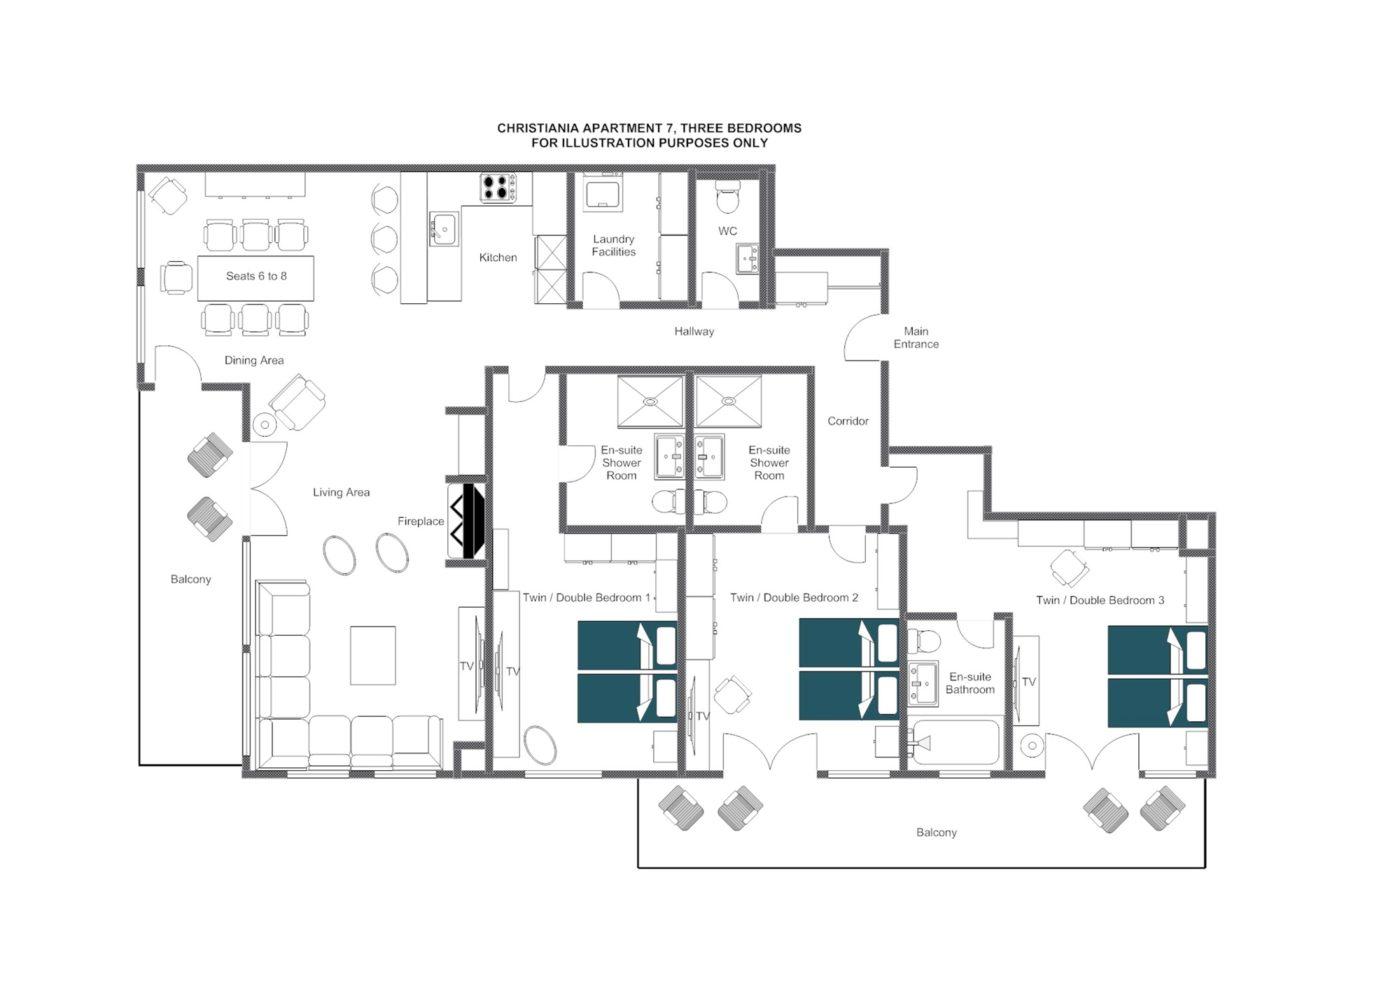 Christiania Apartment 7 Zermatt Floor Plan 1